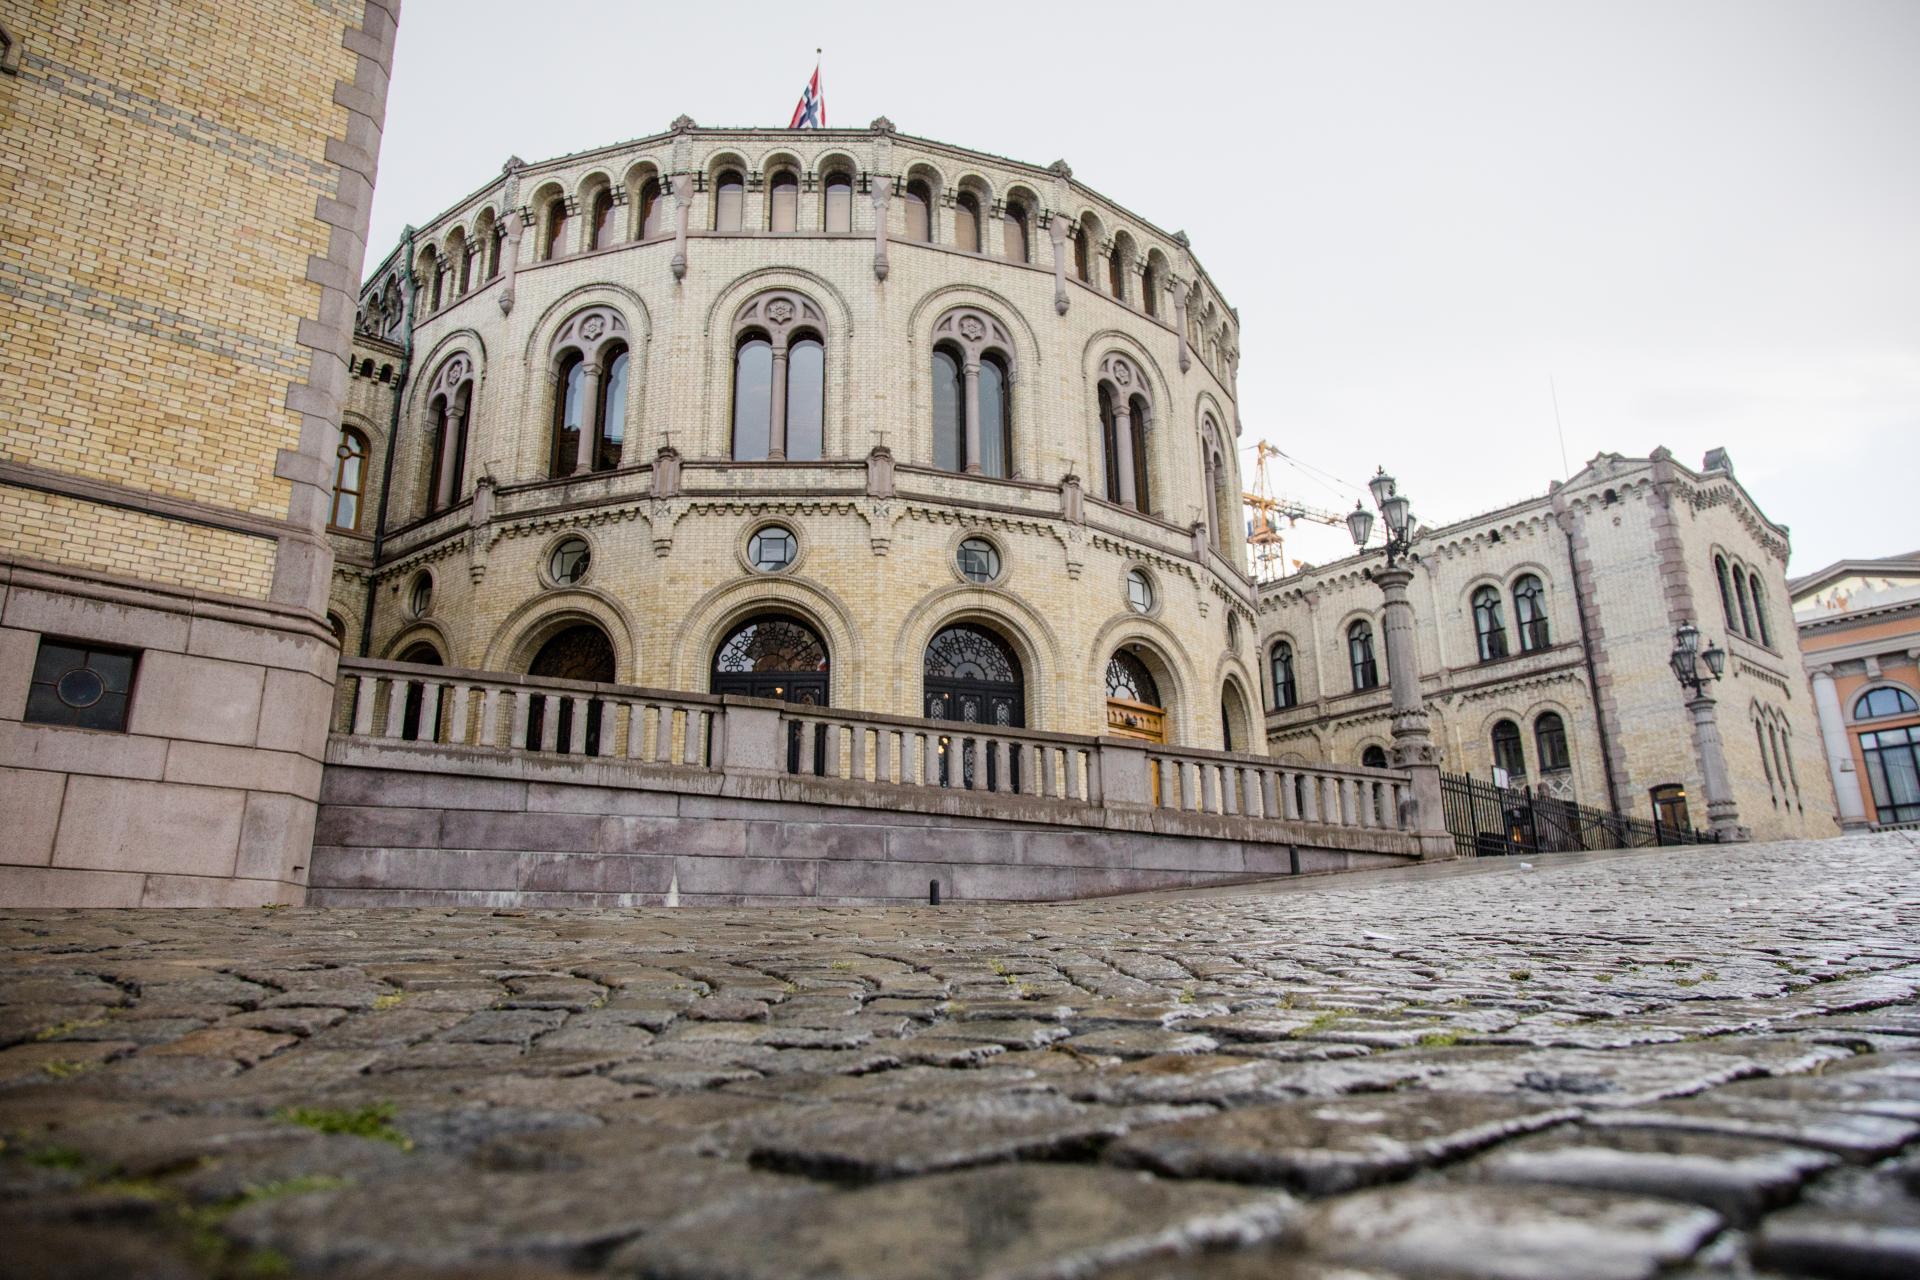 3c423a476 Hverken Haugesund, Karmøy eller Tysvær nevnes i Statsbudsjettet ...